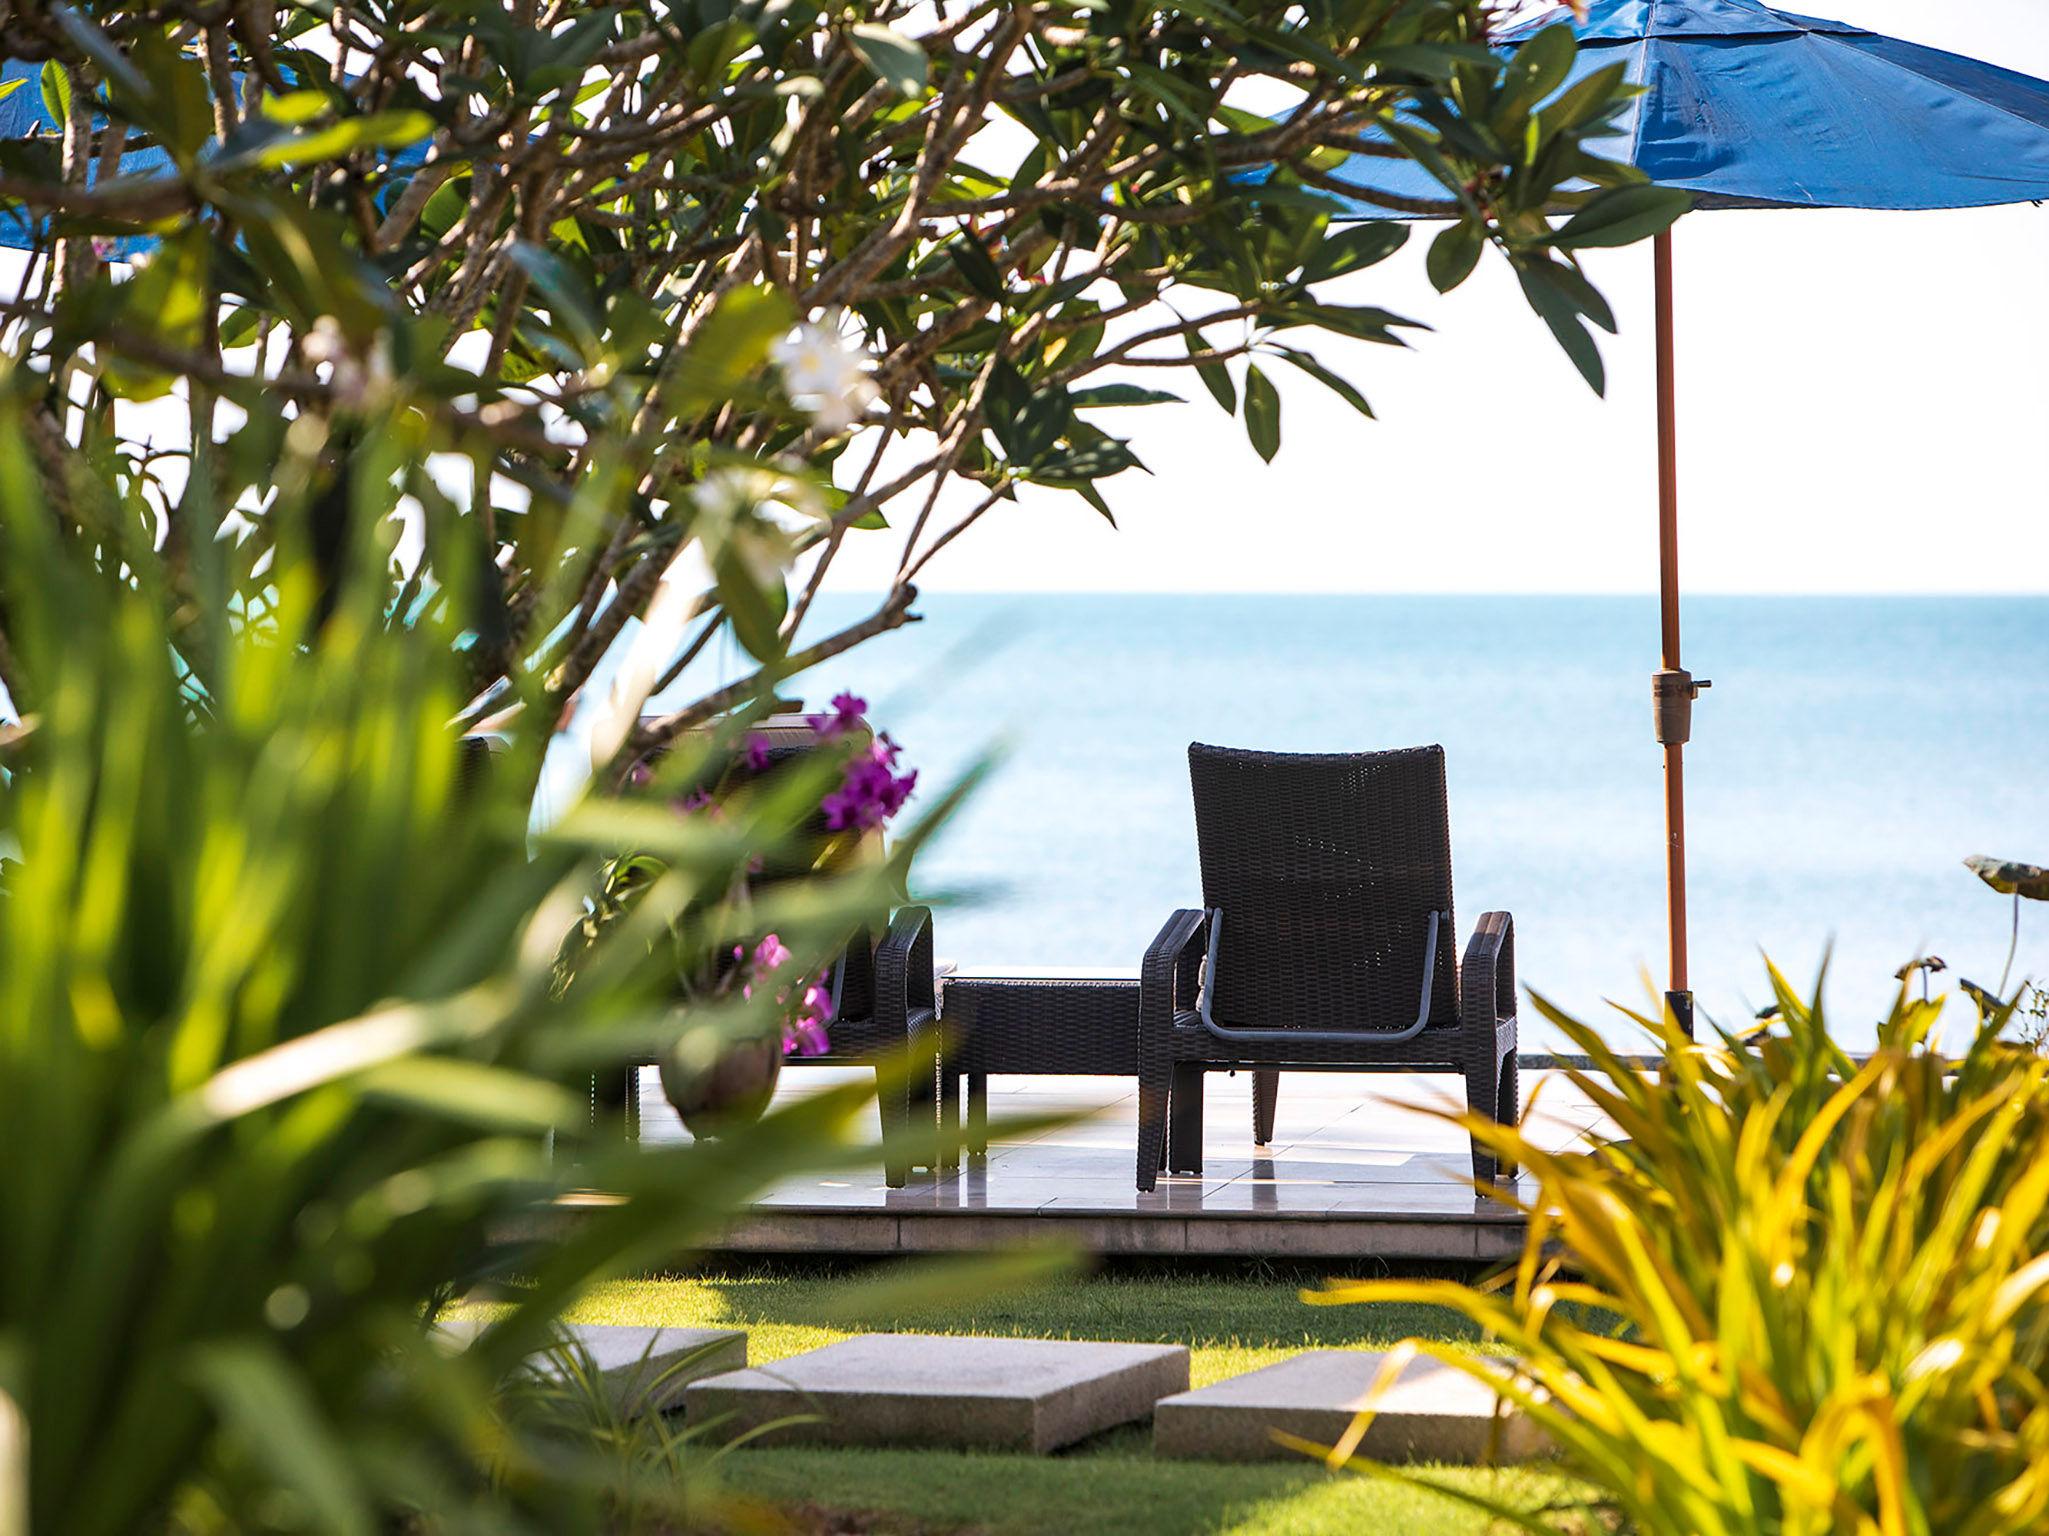 Tawantok Beach Villas - Villa 2 - Tropical lush